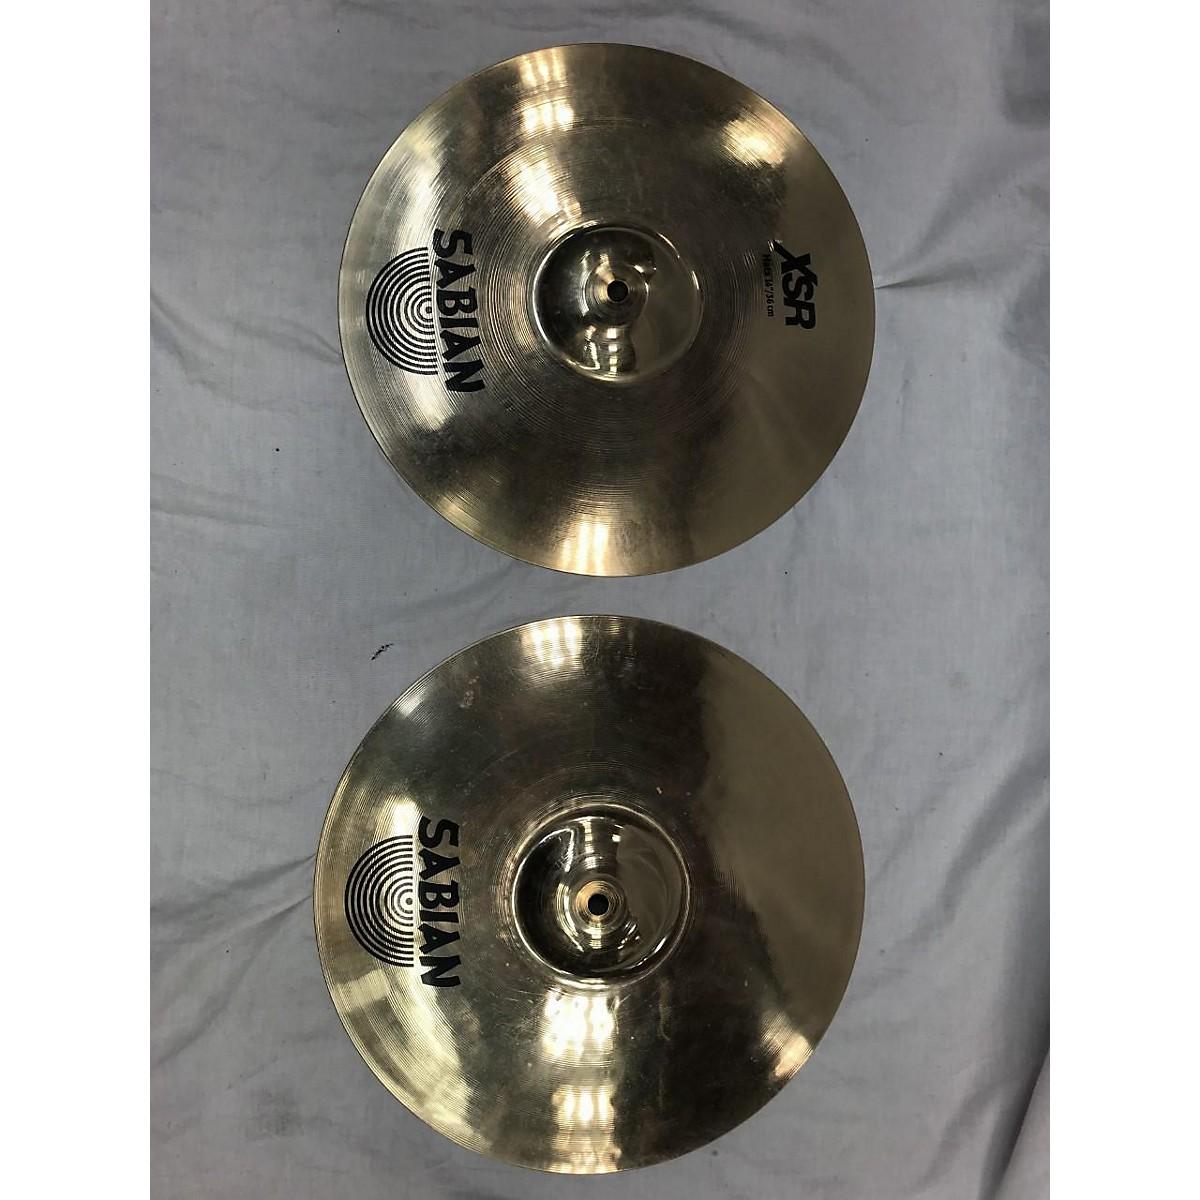 Sabian 14in XSR Hi-hat Pair Cymbal